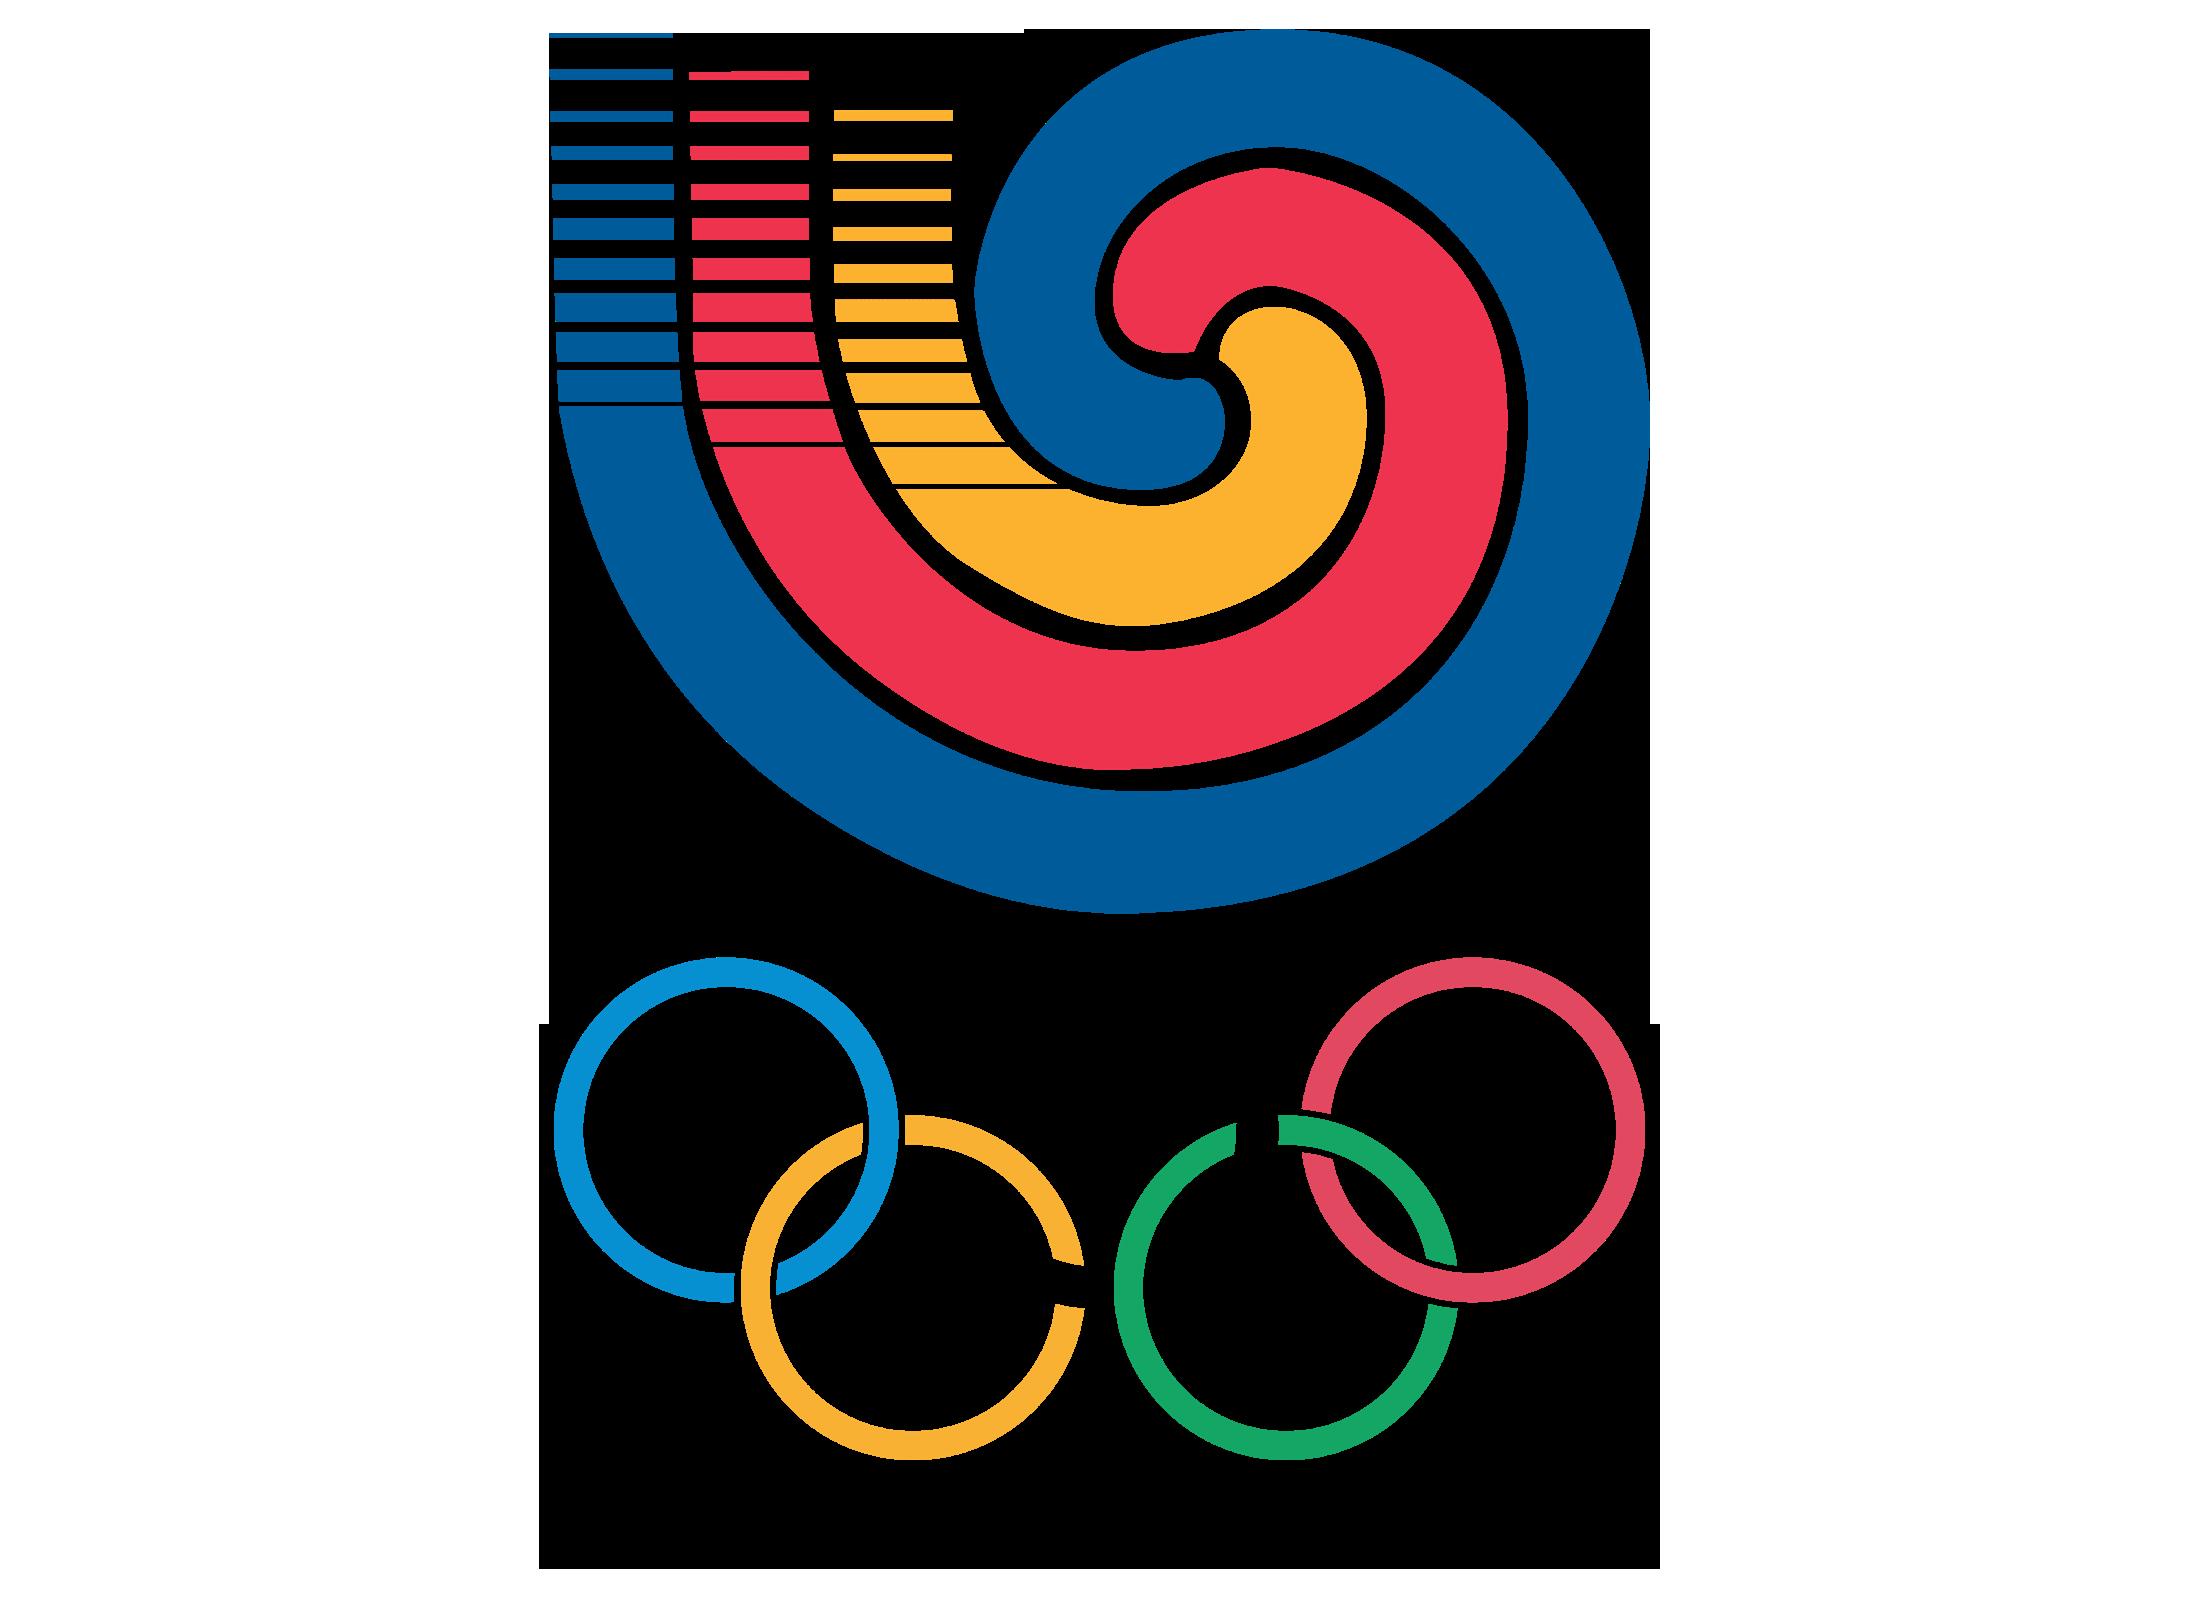 Seoul Summer Olympics 1988 Southkorea Olympic Logo Olympic Games Logos